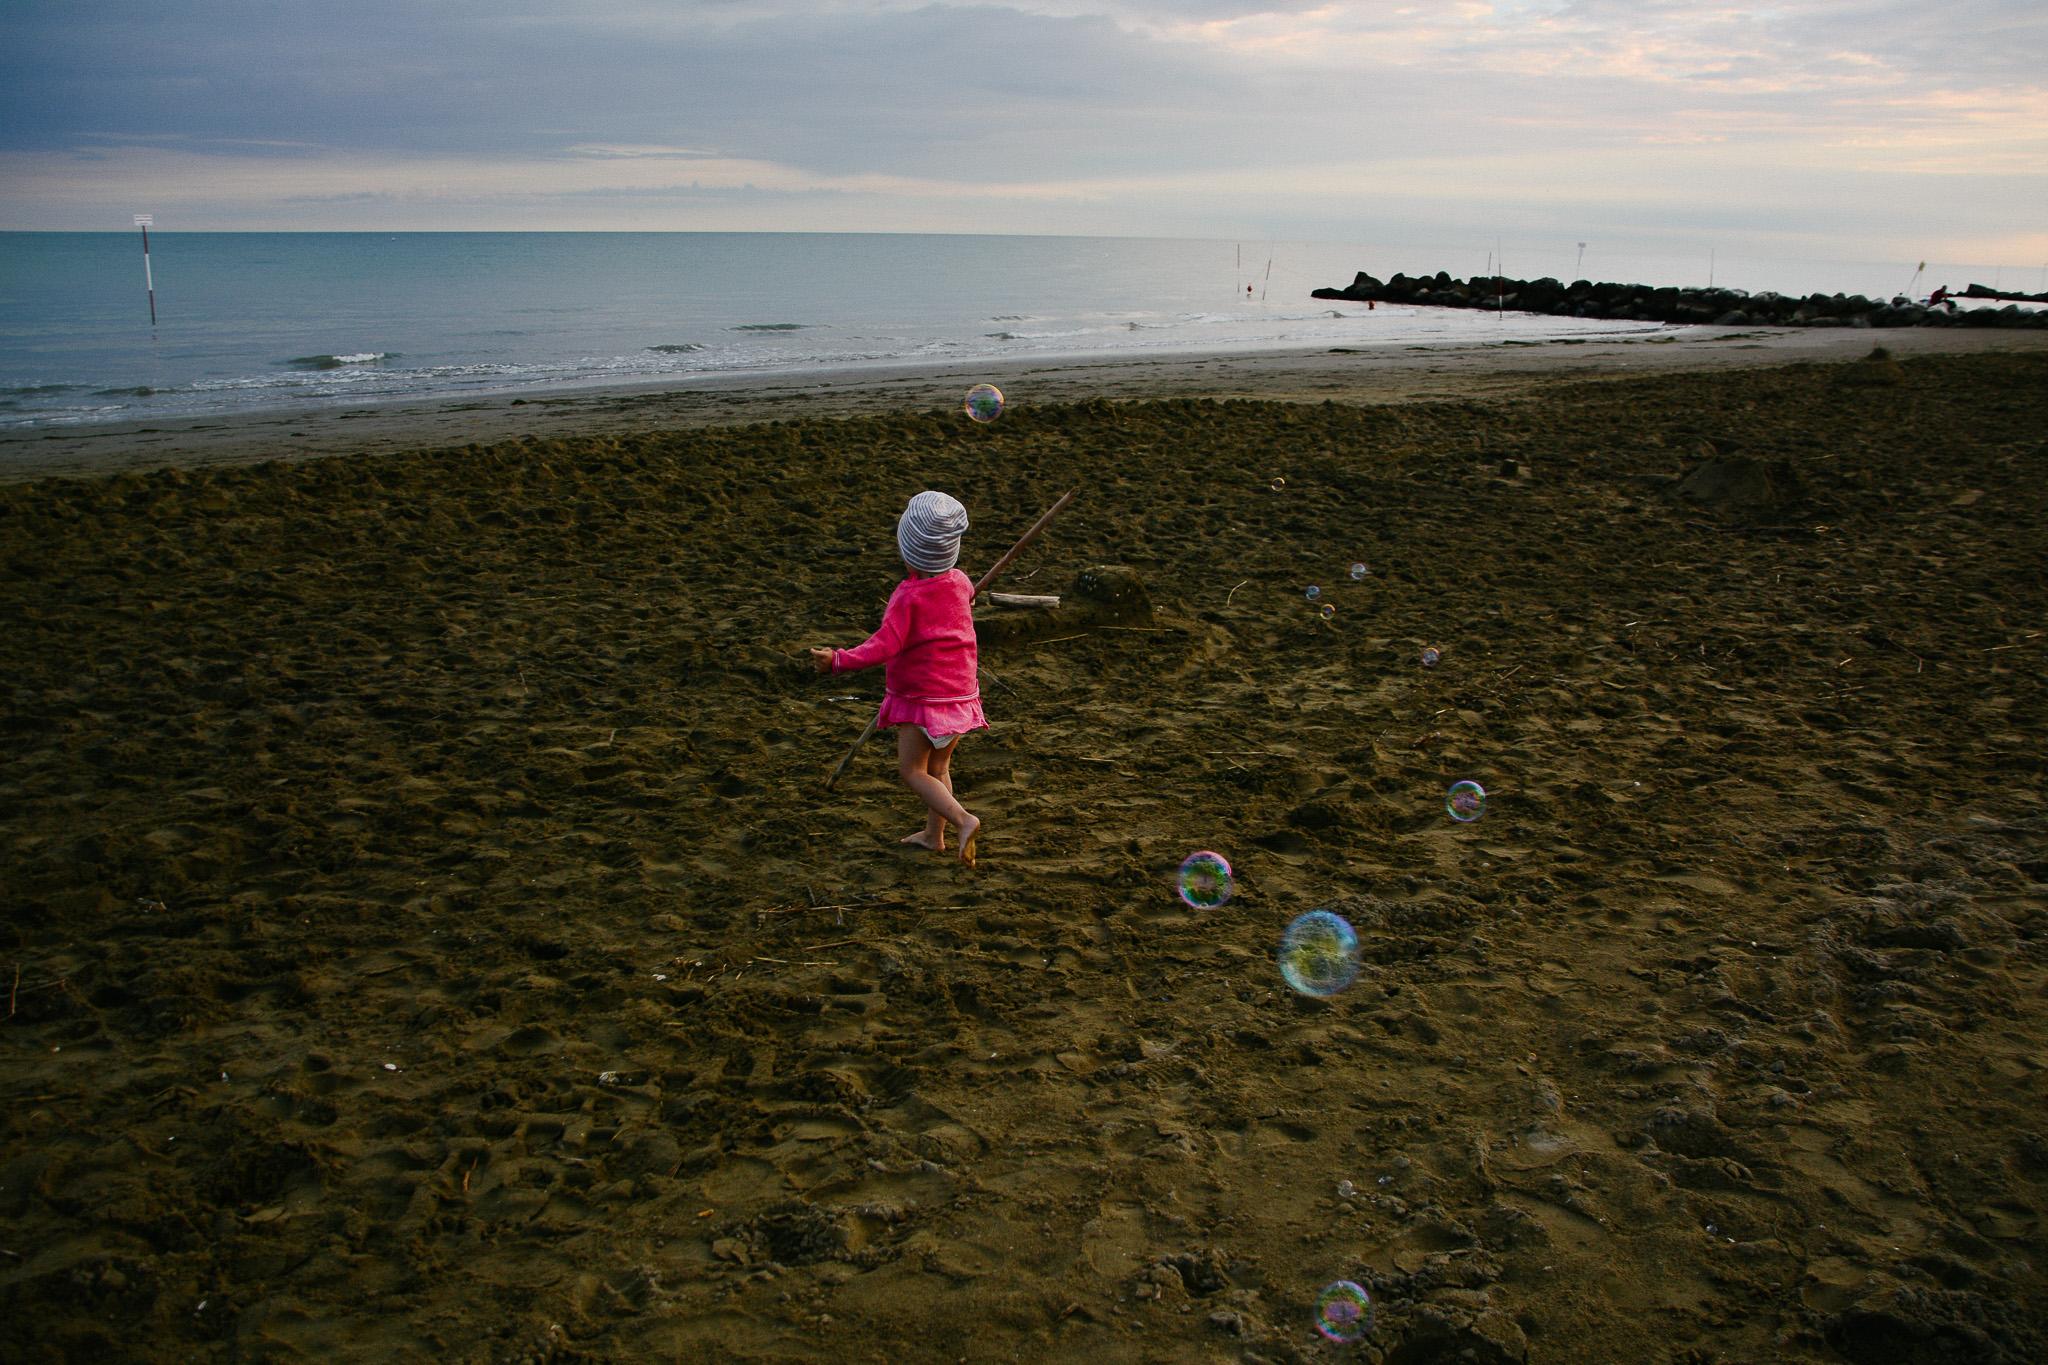 09-20-Caorle-beach-100_LR edited_FB-2.jpg